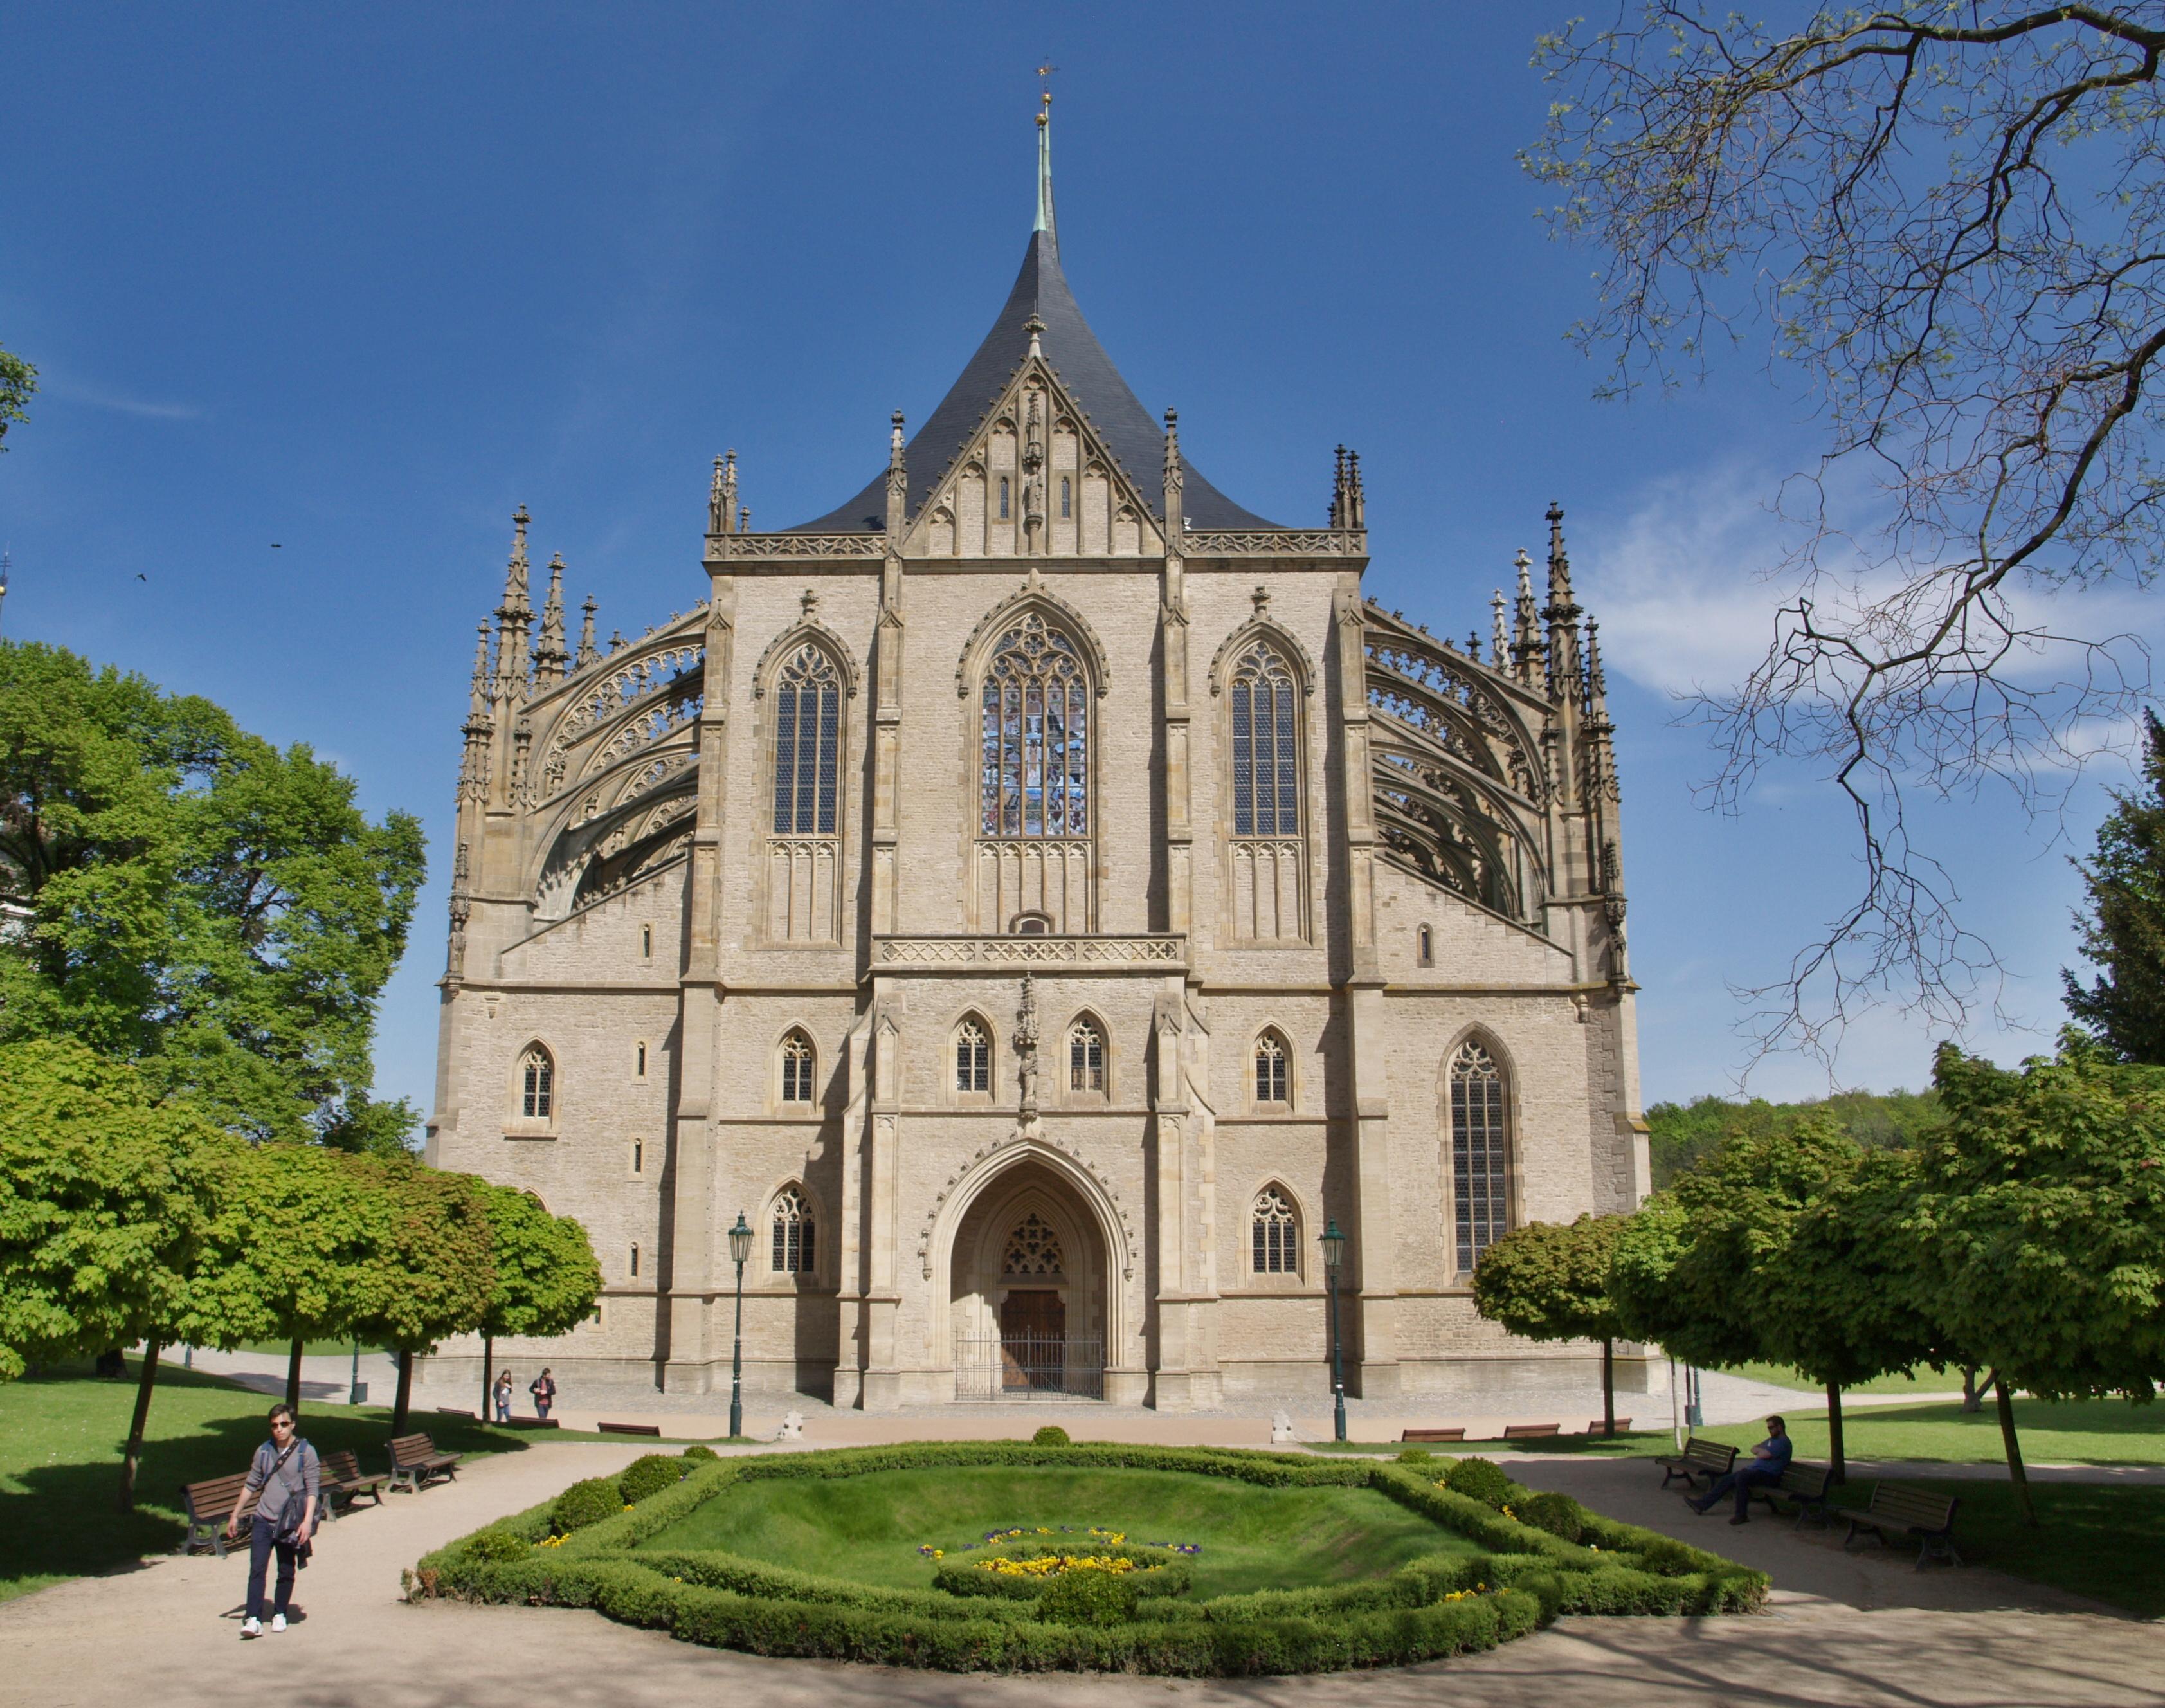 9034-chram-sv-barbora-st-barbara-s-cathedral-1.jpg